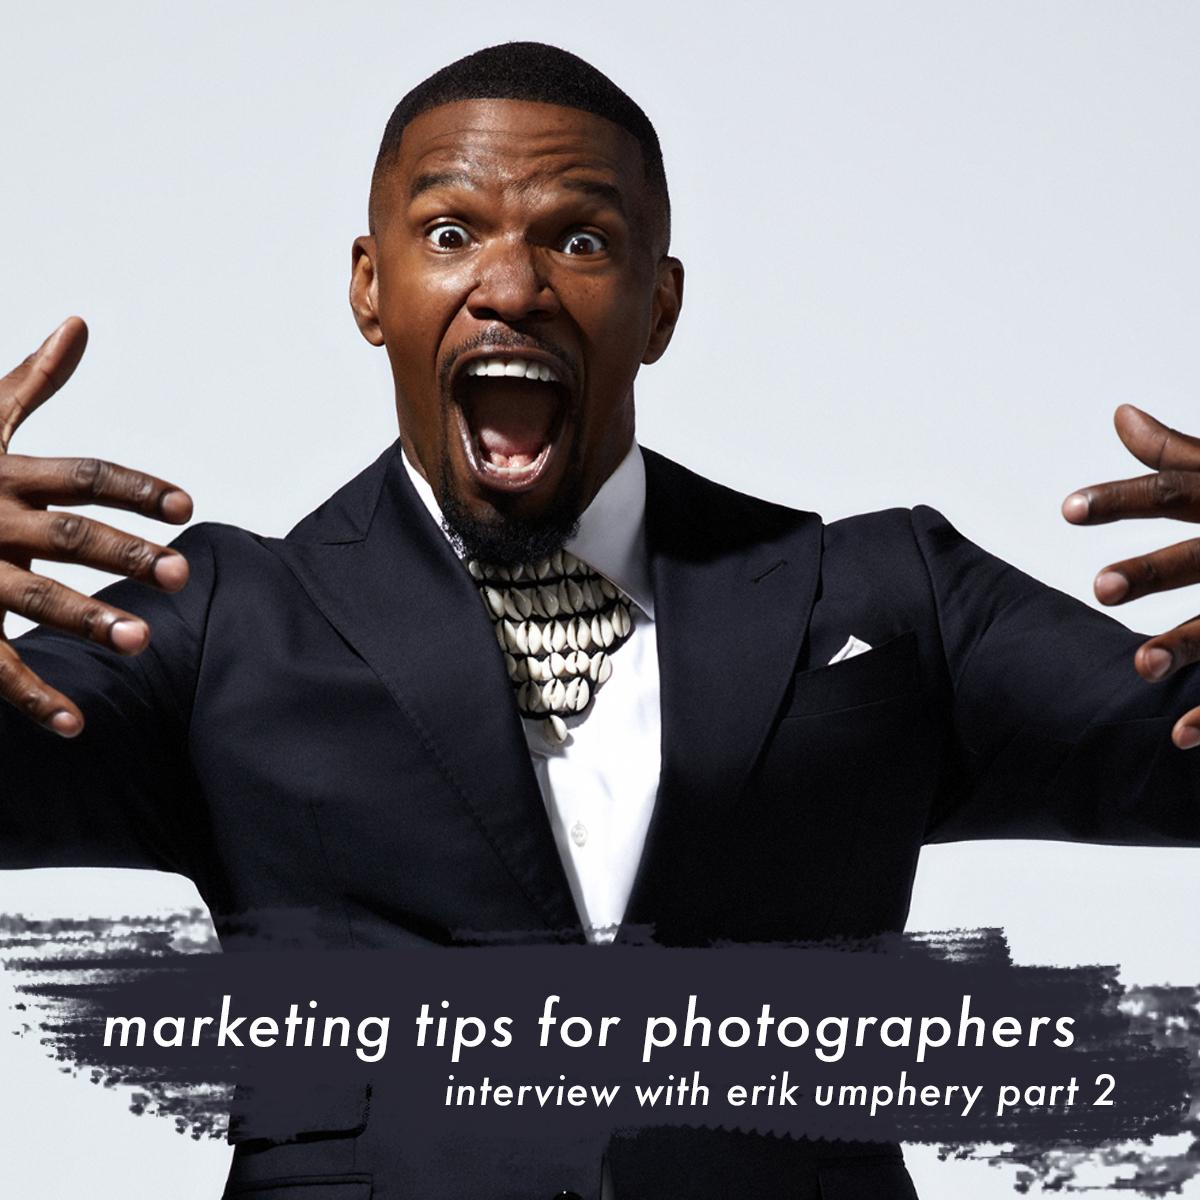 marketing-tips-for-photographers-erik-umphery-part2.jpg